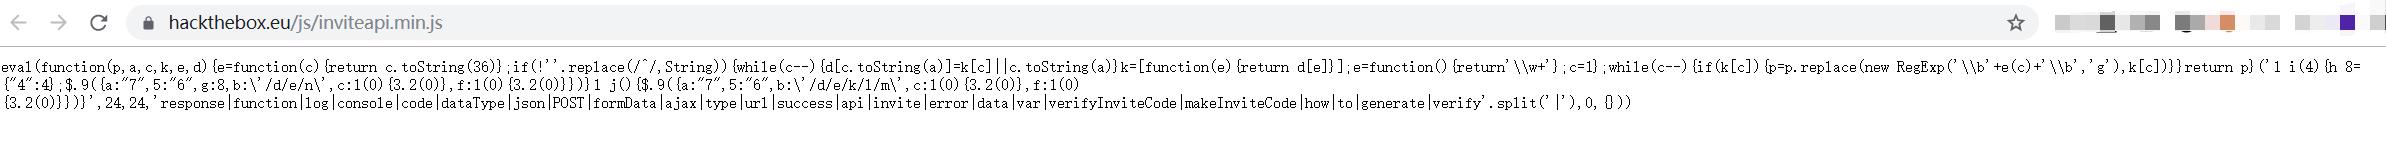 hackthebox渗透测试网站CTF练习注册获得邀请码方法插图2